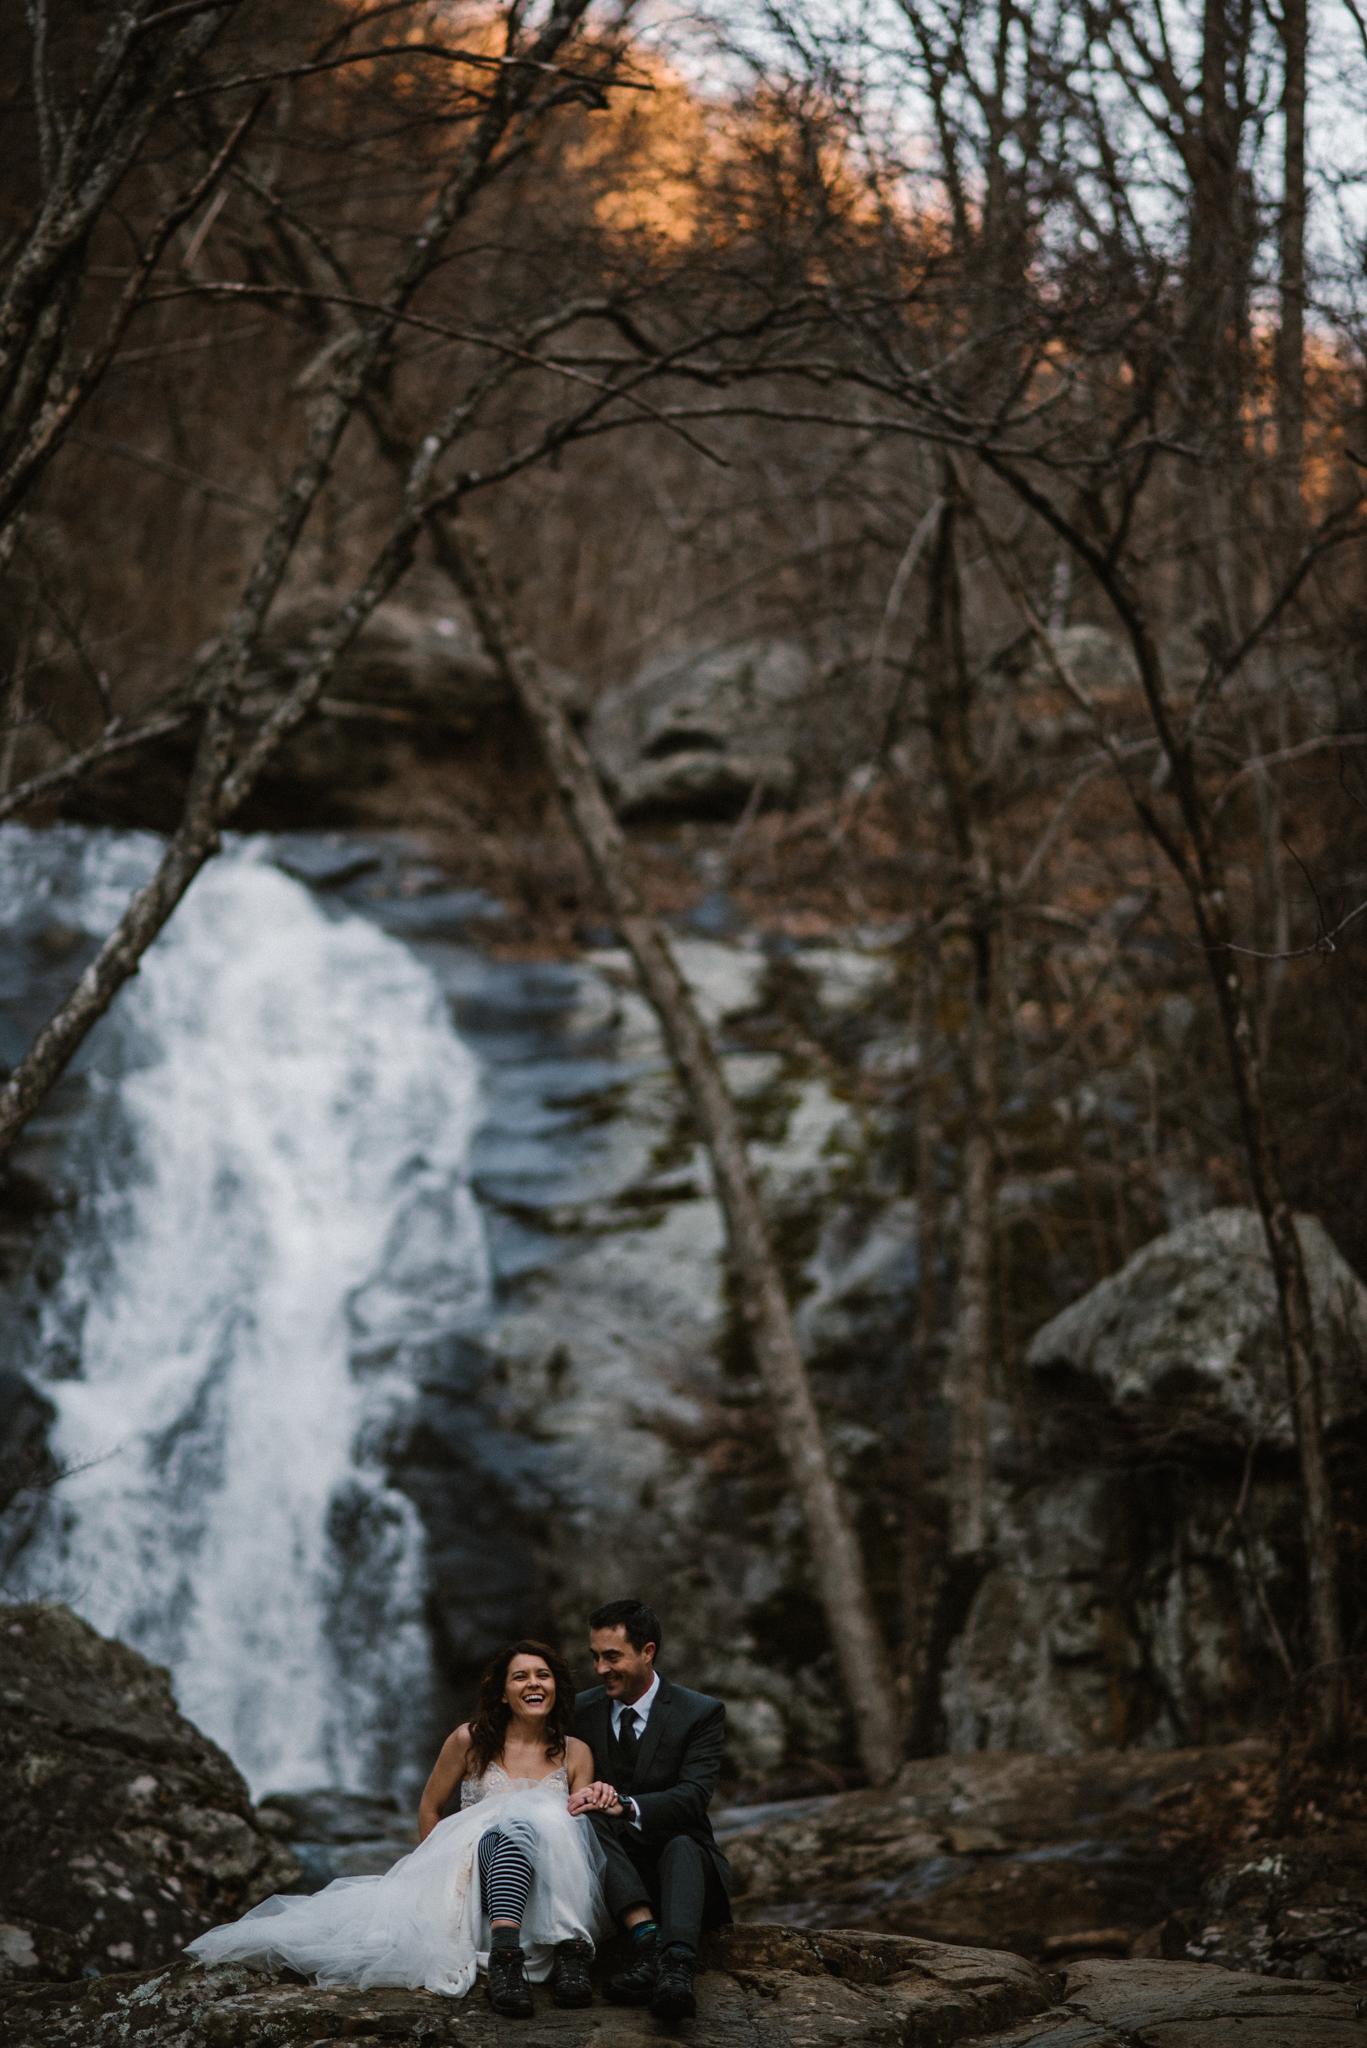 Stephanie and Steve - Shenandoah National Park Elopement - Sunrise Hiking Elopement - Adventurous Elopement - Virginia Elopement Photographer - Shenandoah national Park Wedding Photographer - White Sails Creative_15.jpg